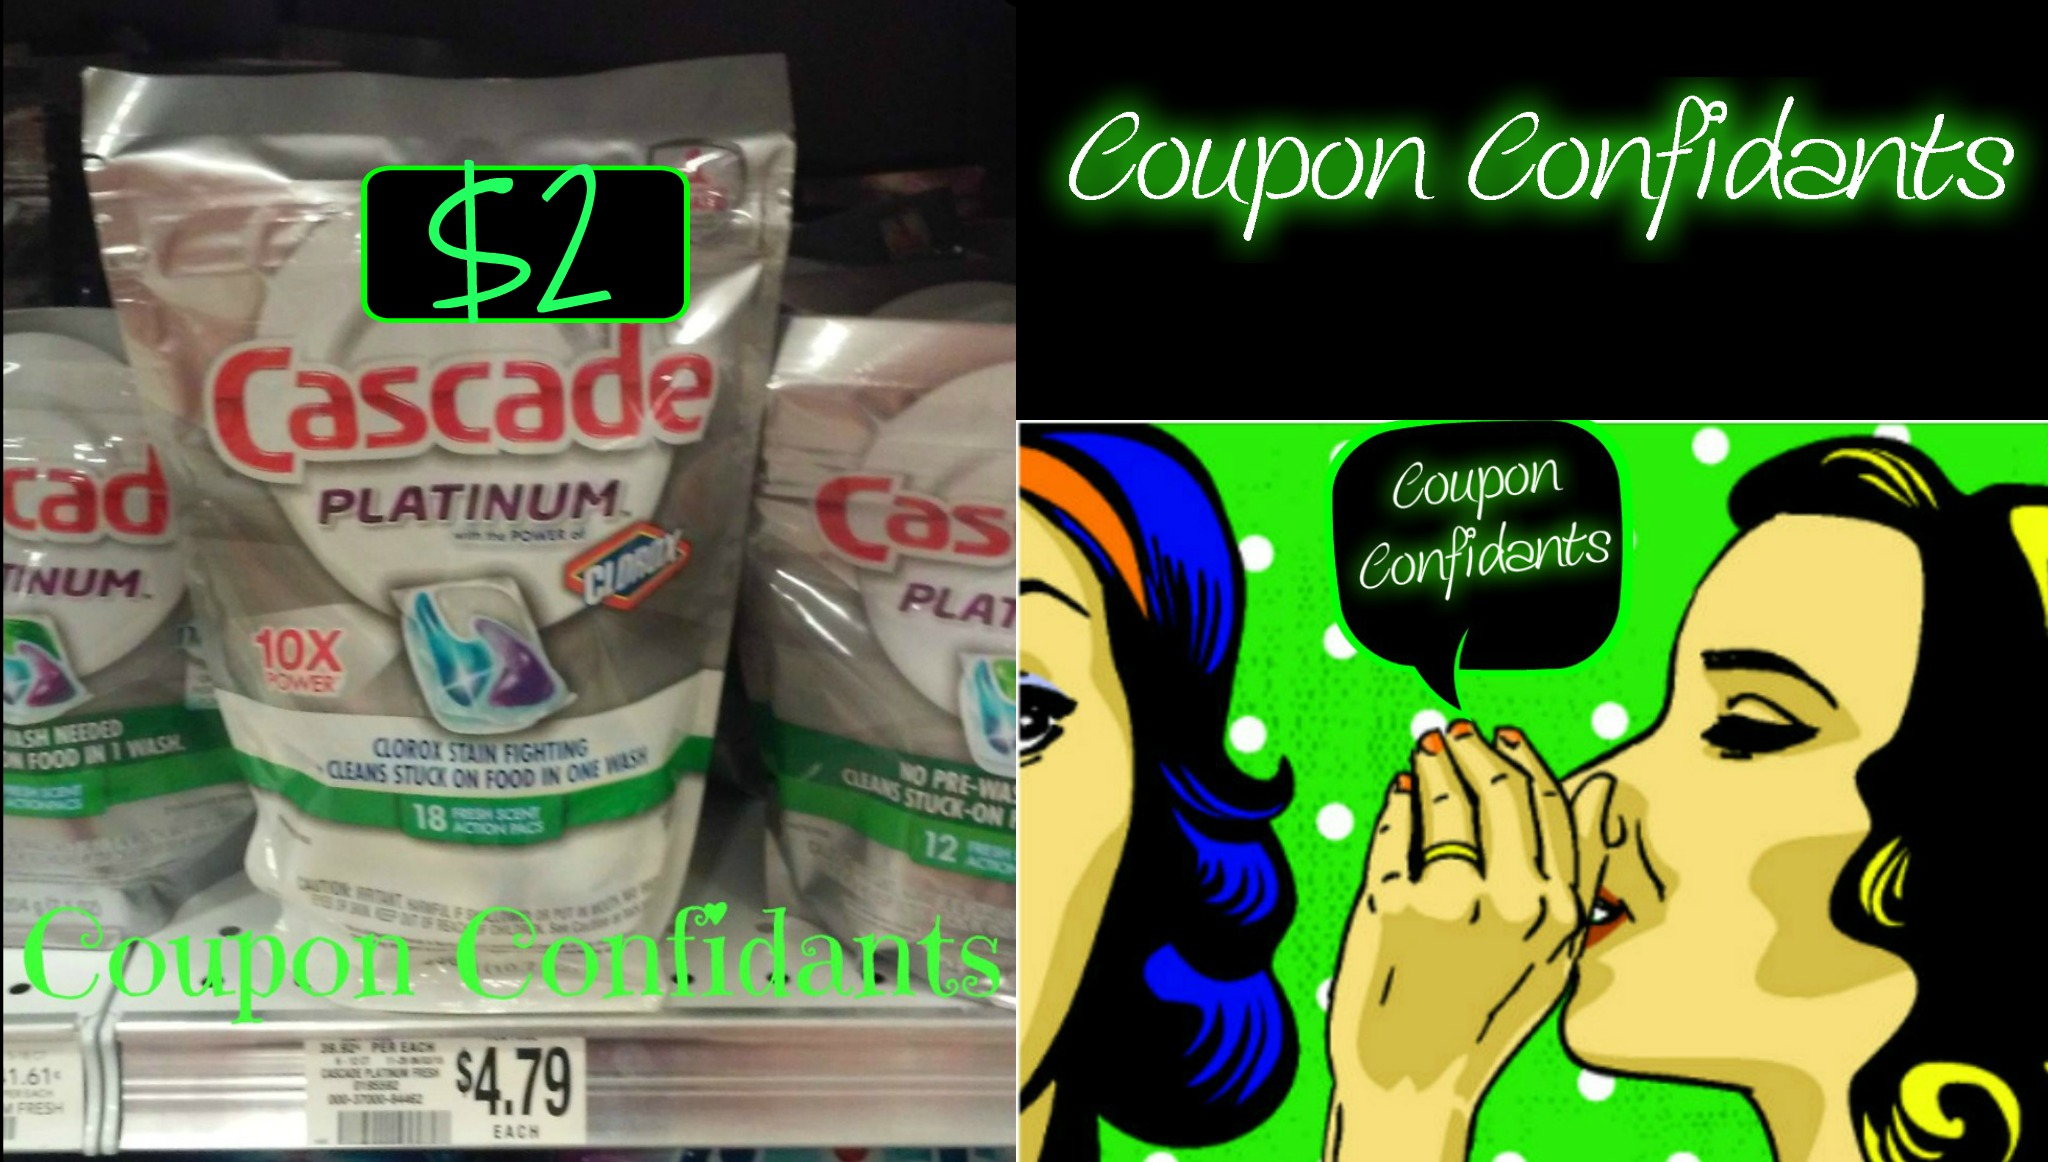 Cascade bay discount coupons